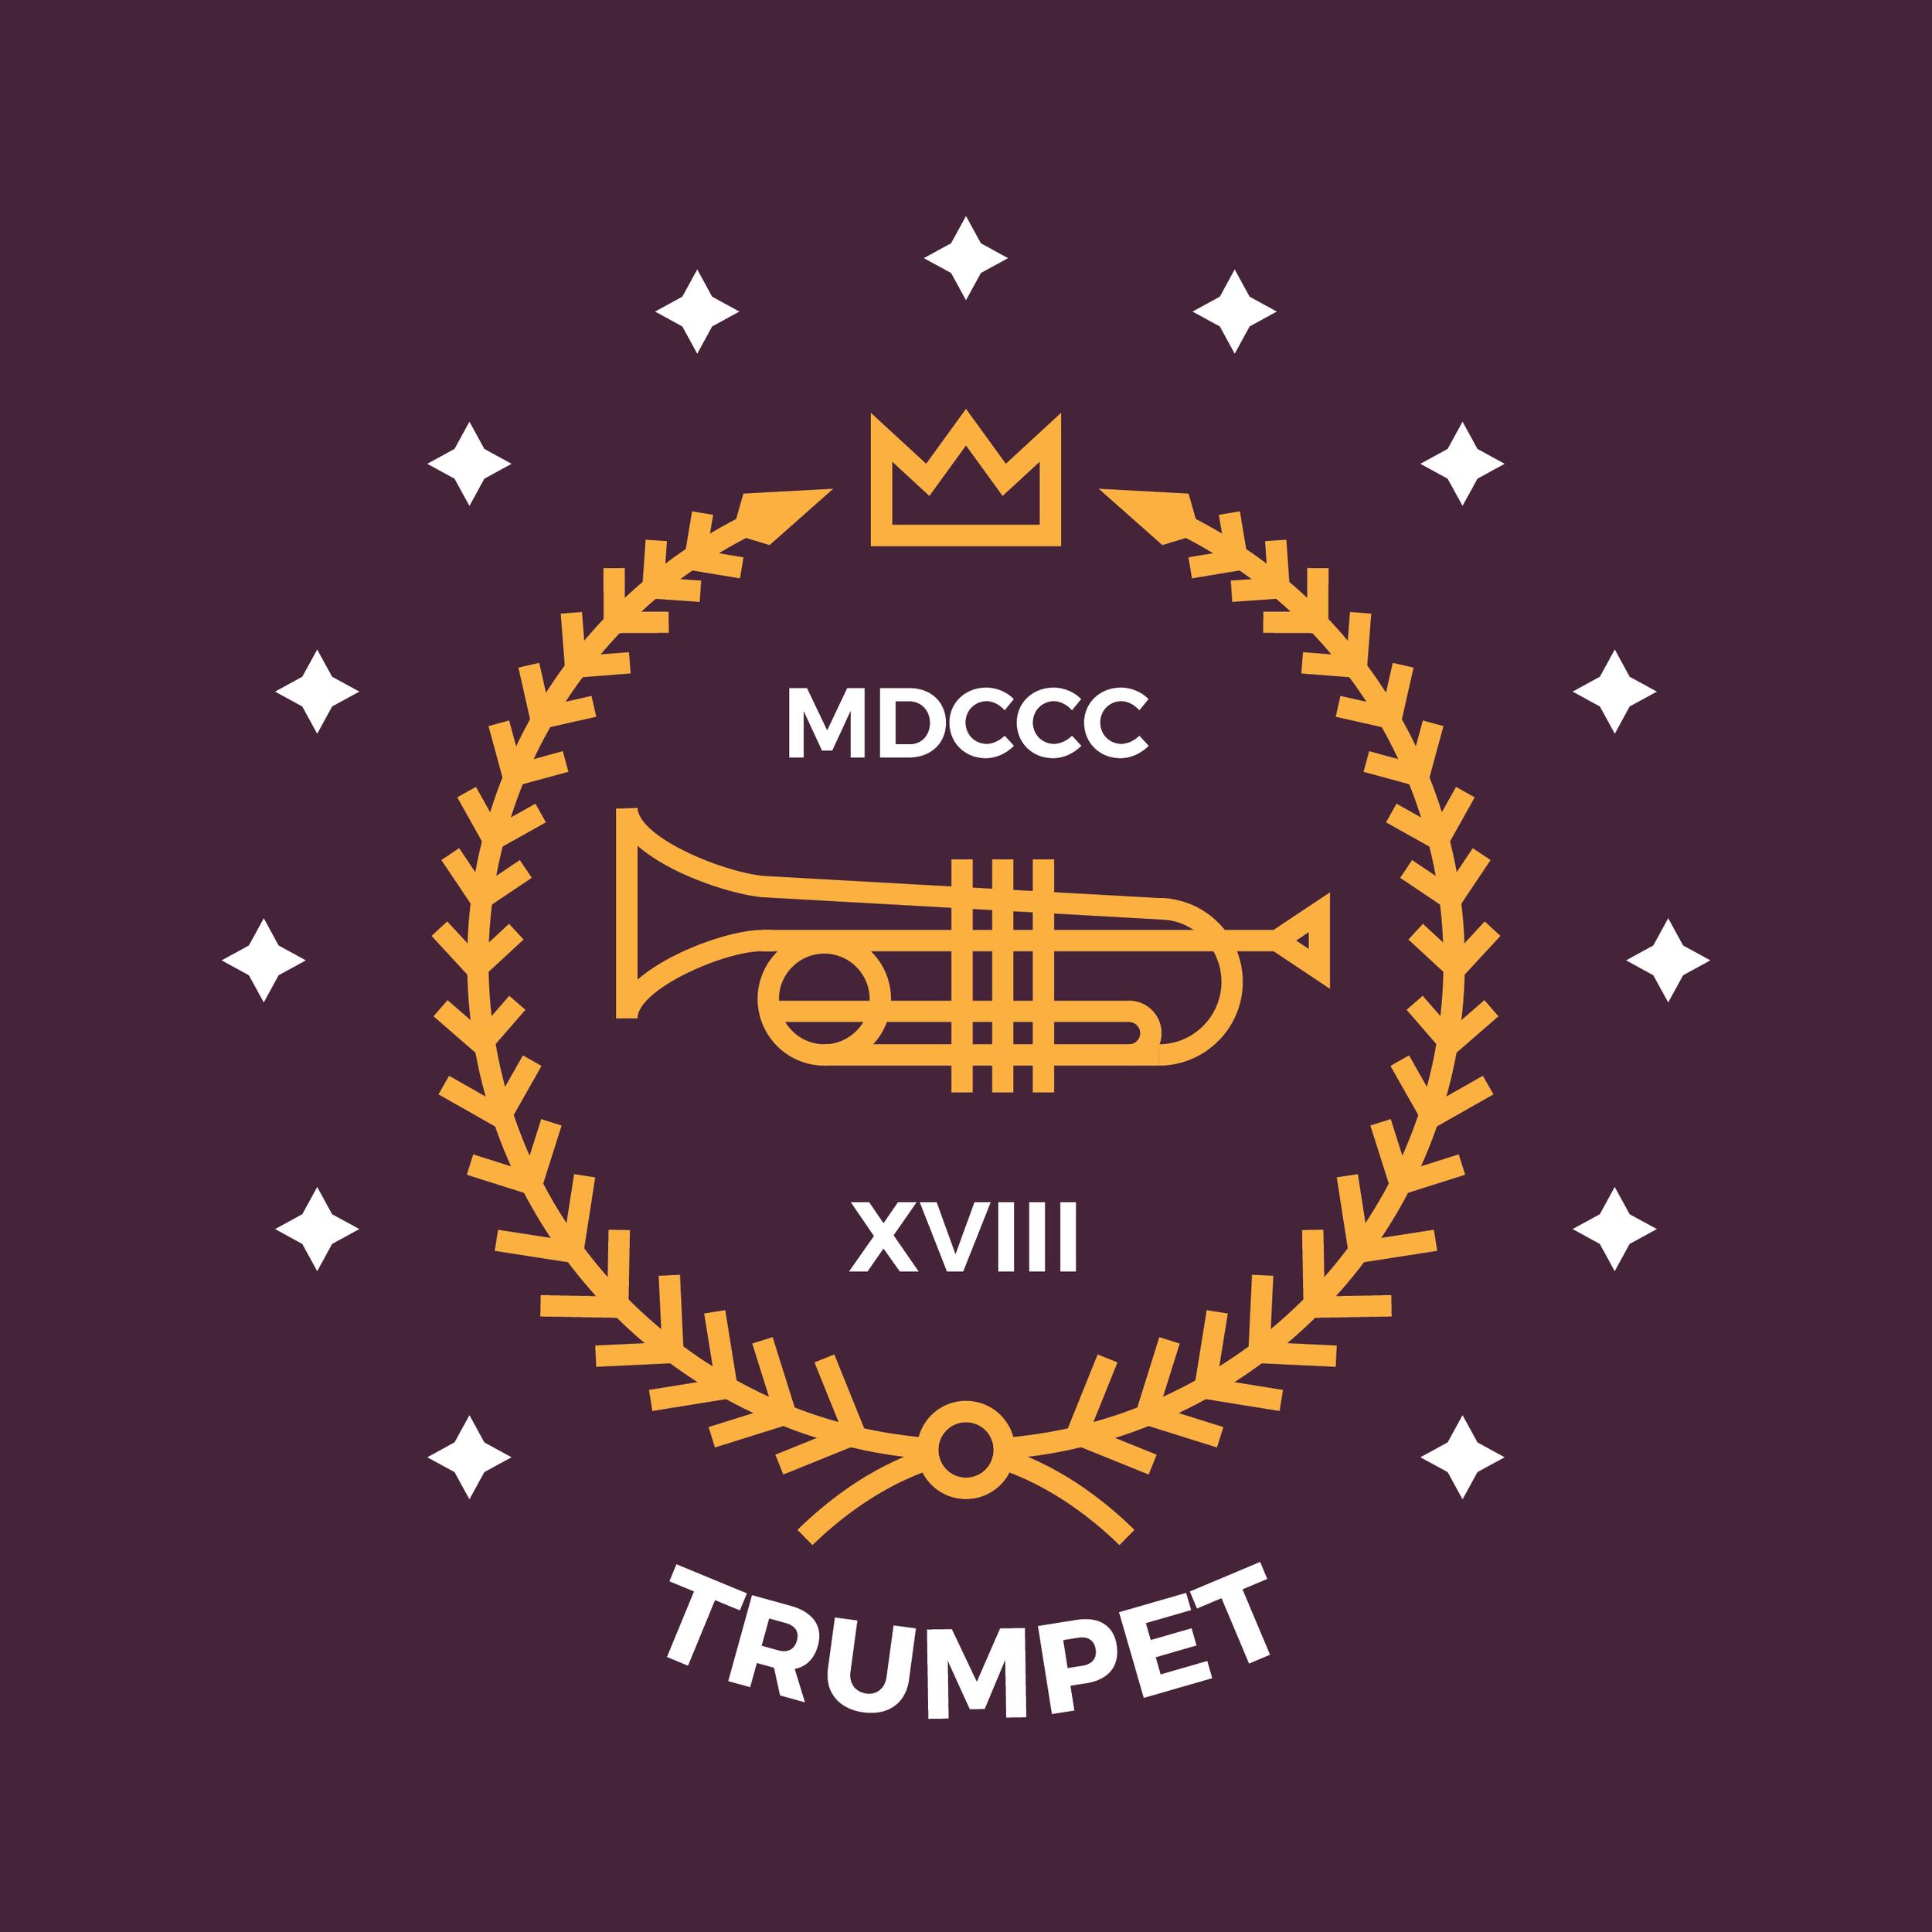 Trumpet-01.png